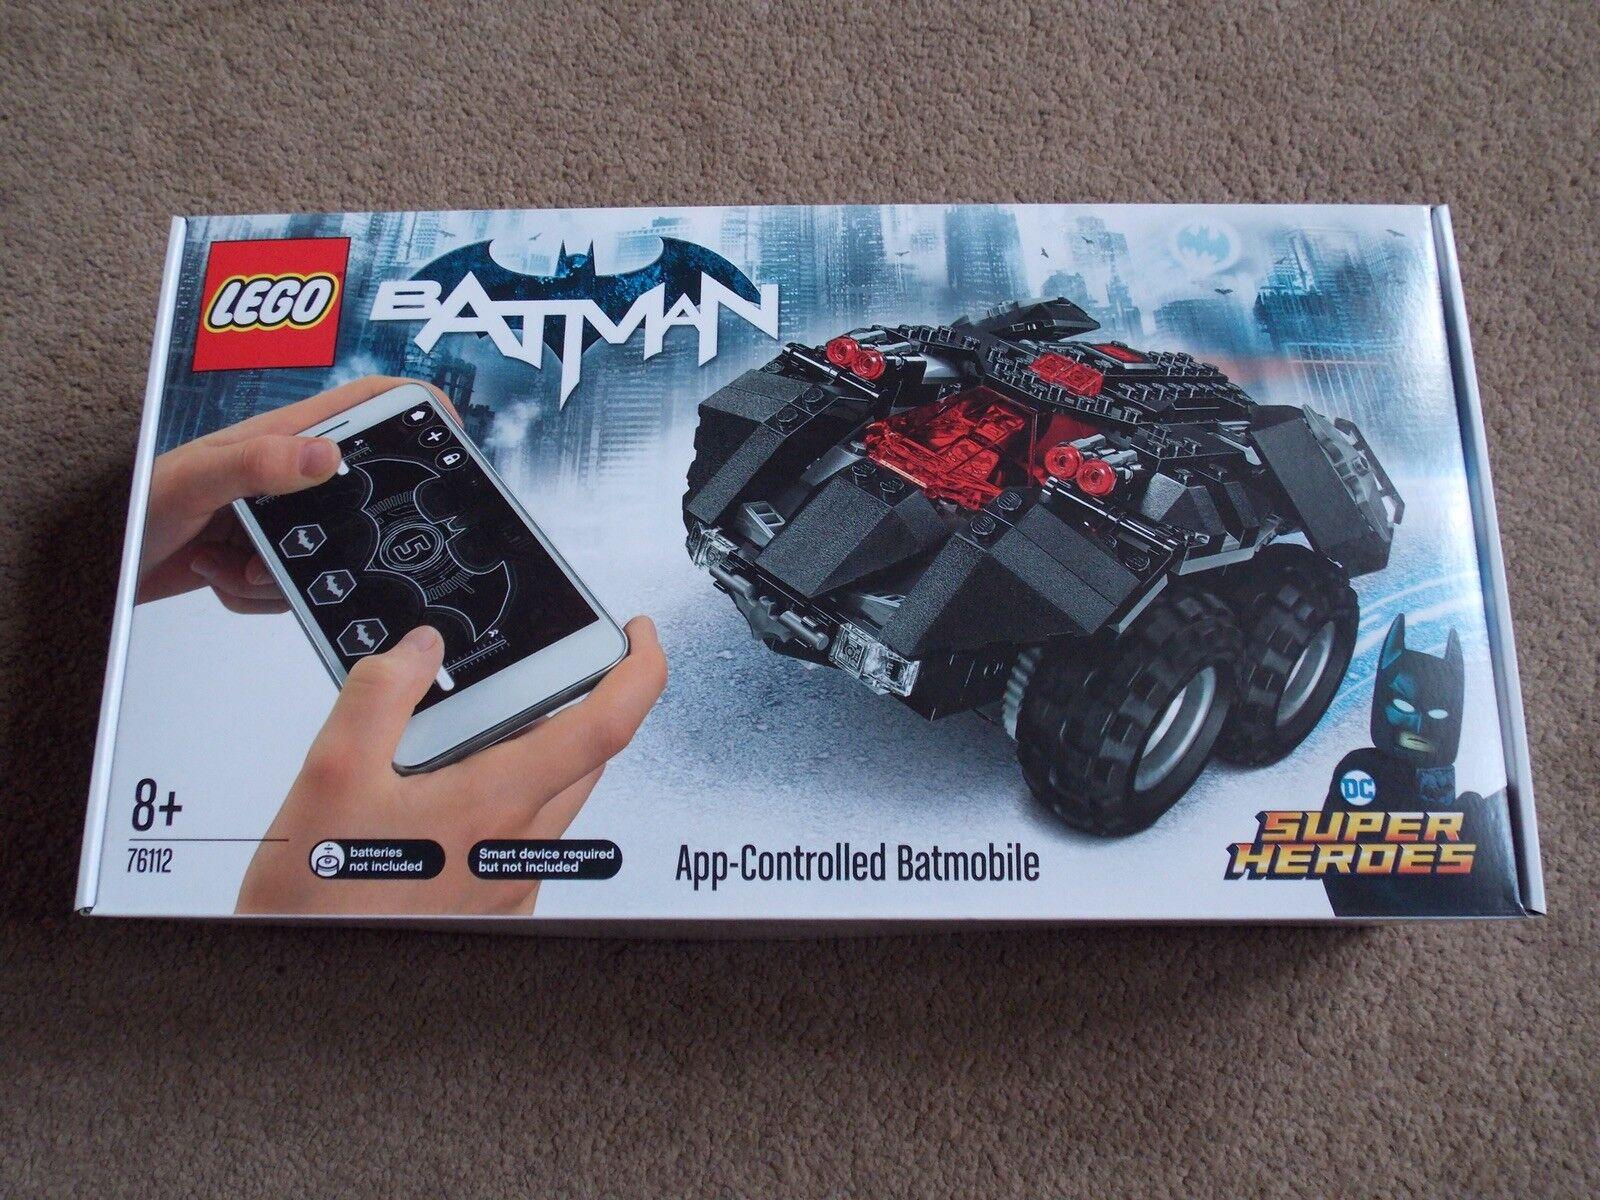 LEGO-Super Heroes (Set 76112-Batman App-controlled Batmobile) BRAND NEW